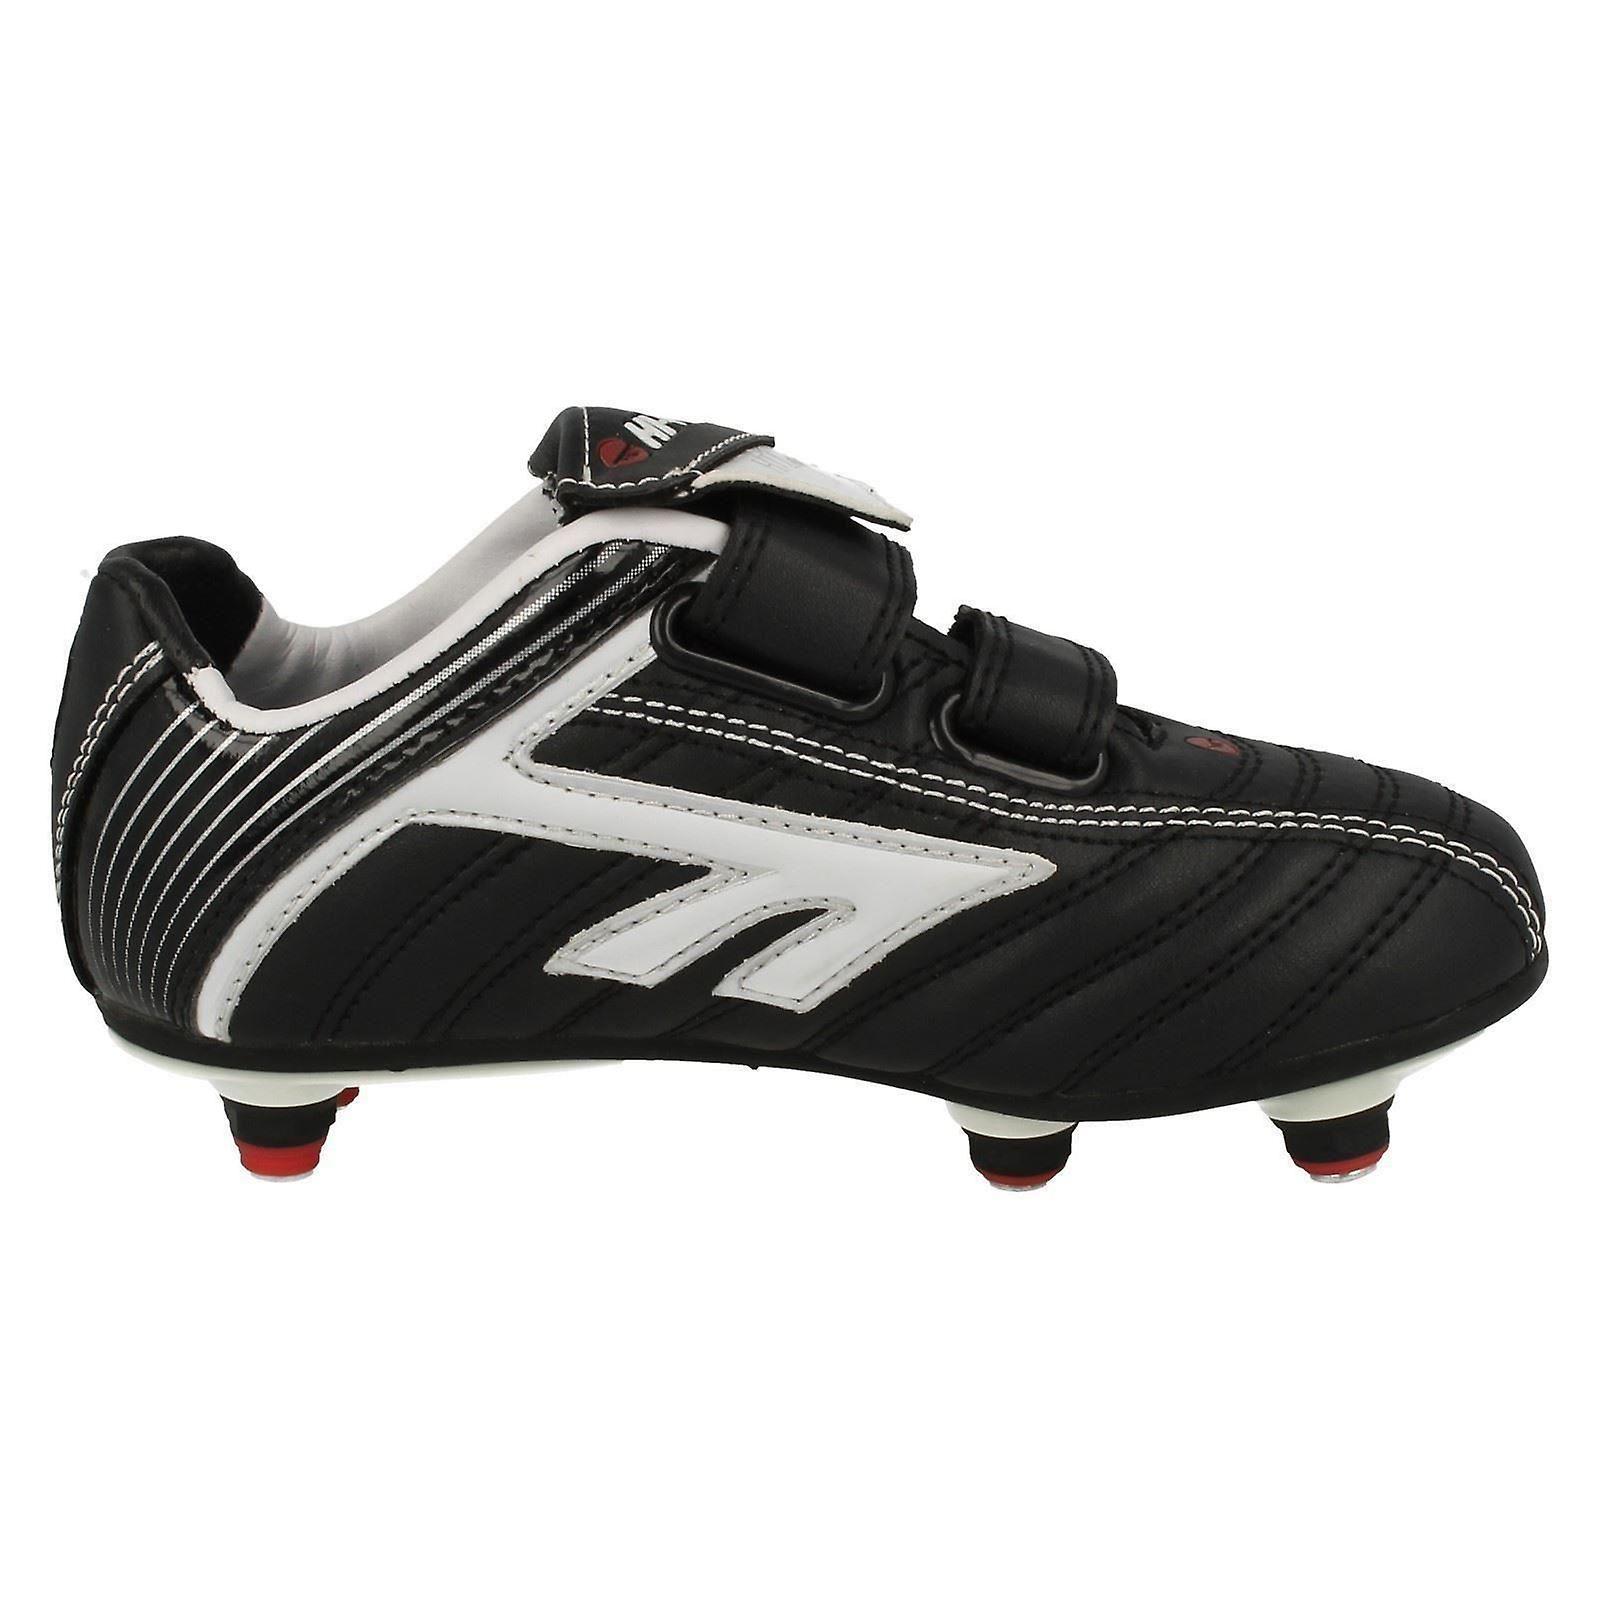 2b90f13aebe4 Boys Hi Tec Removable Studs Football Boots League Pro | Fruugo